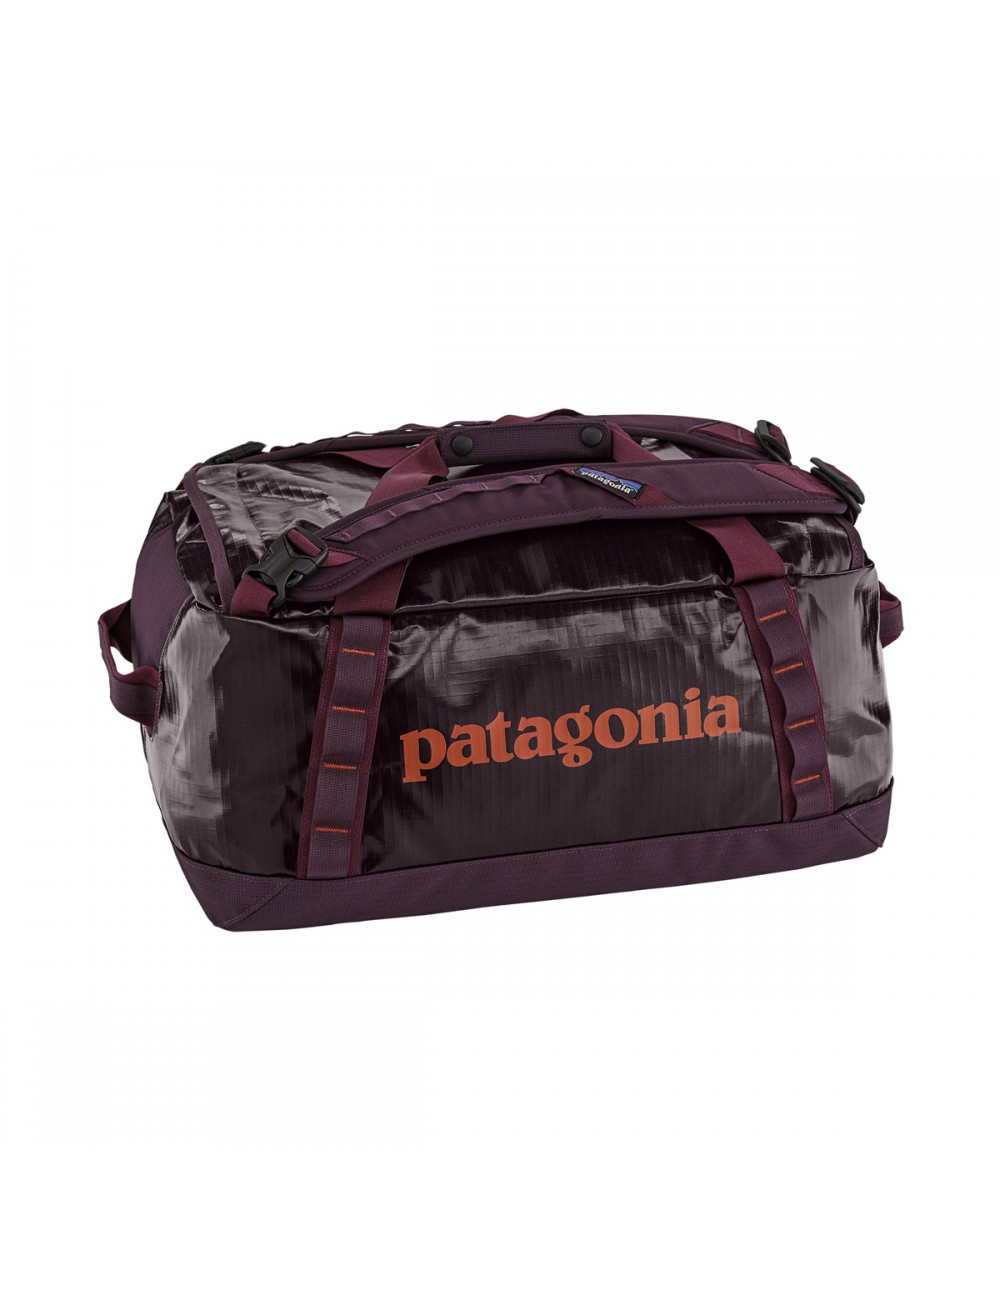 Patagonia Black Hole Duffle 40L - Plum_12042